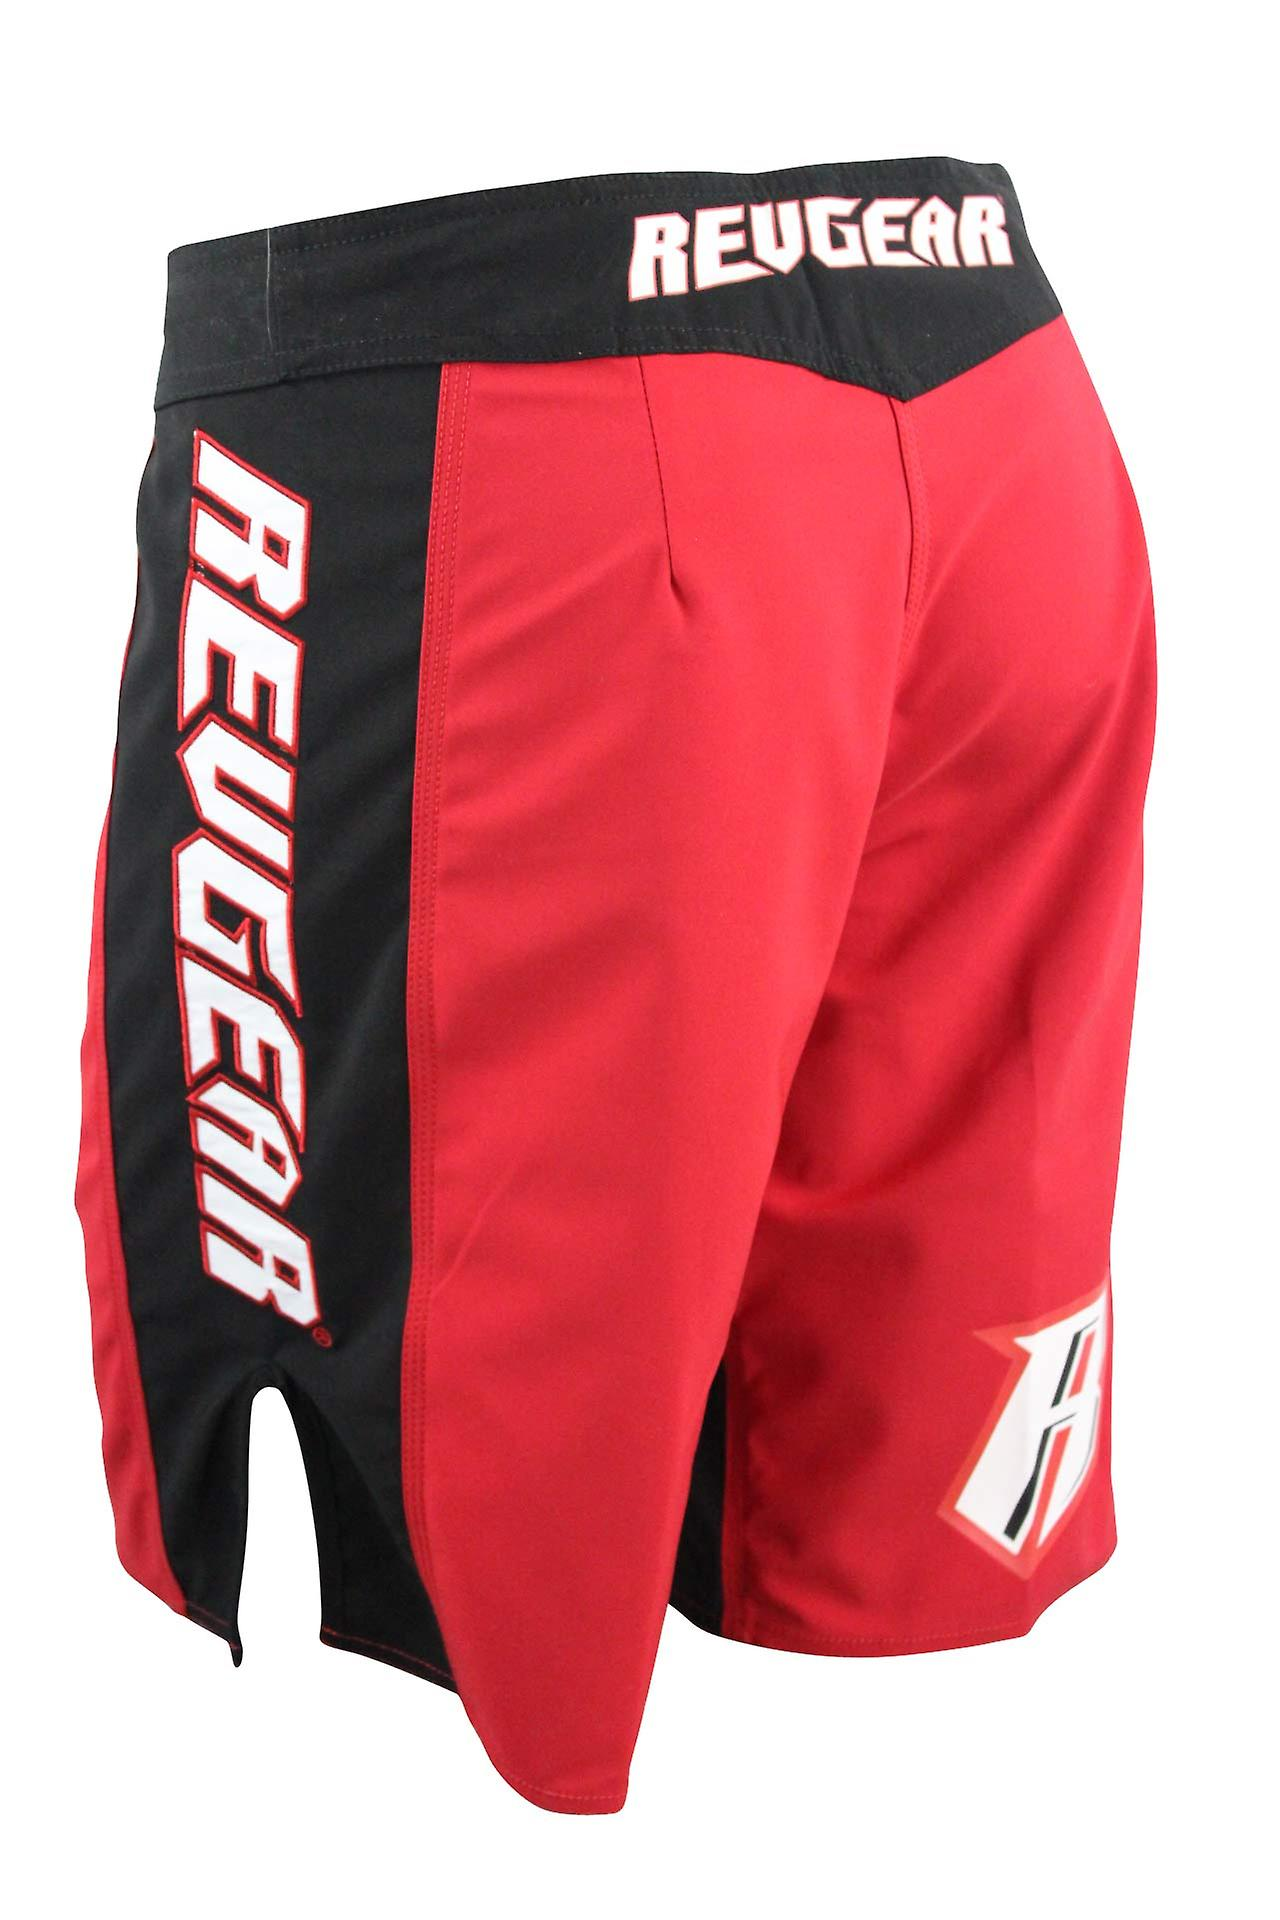 Revgear Mens Spartan Pro III Fight Shorts - Red